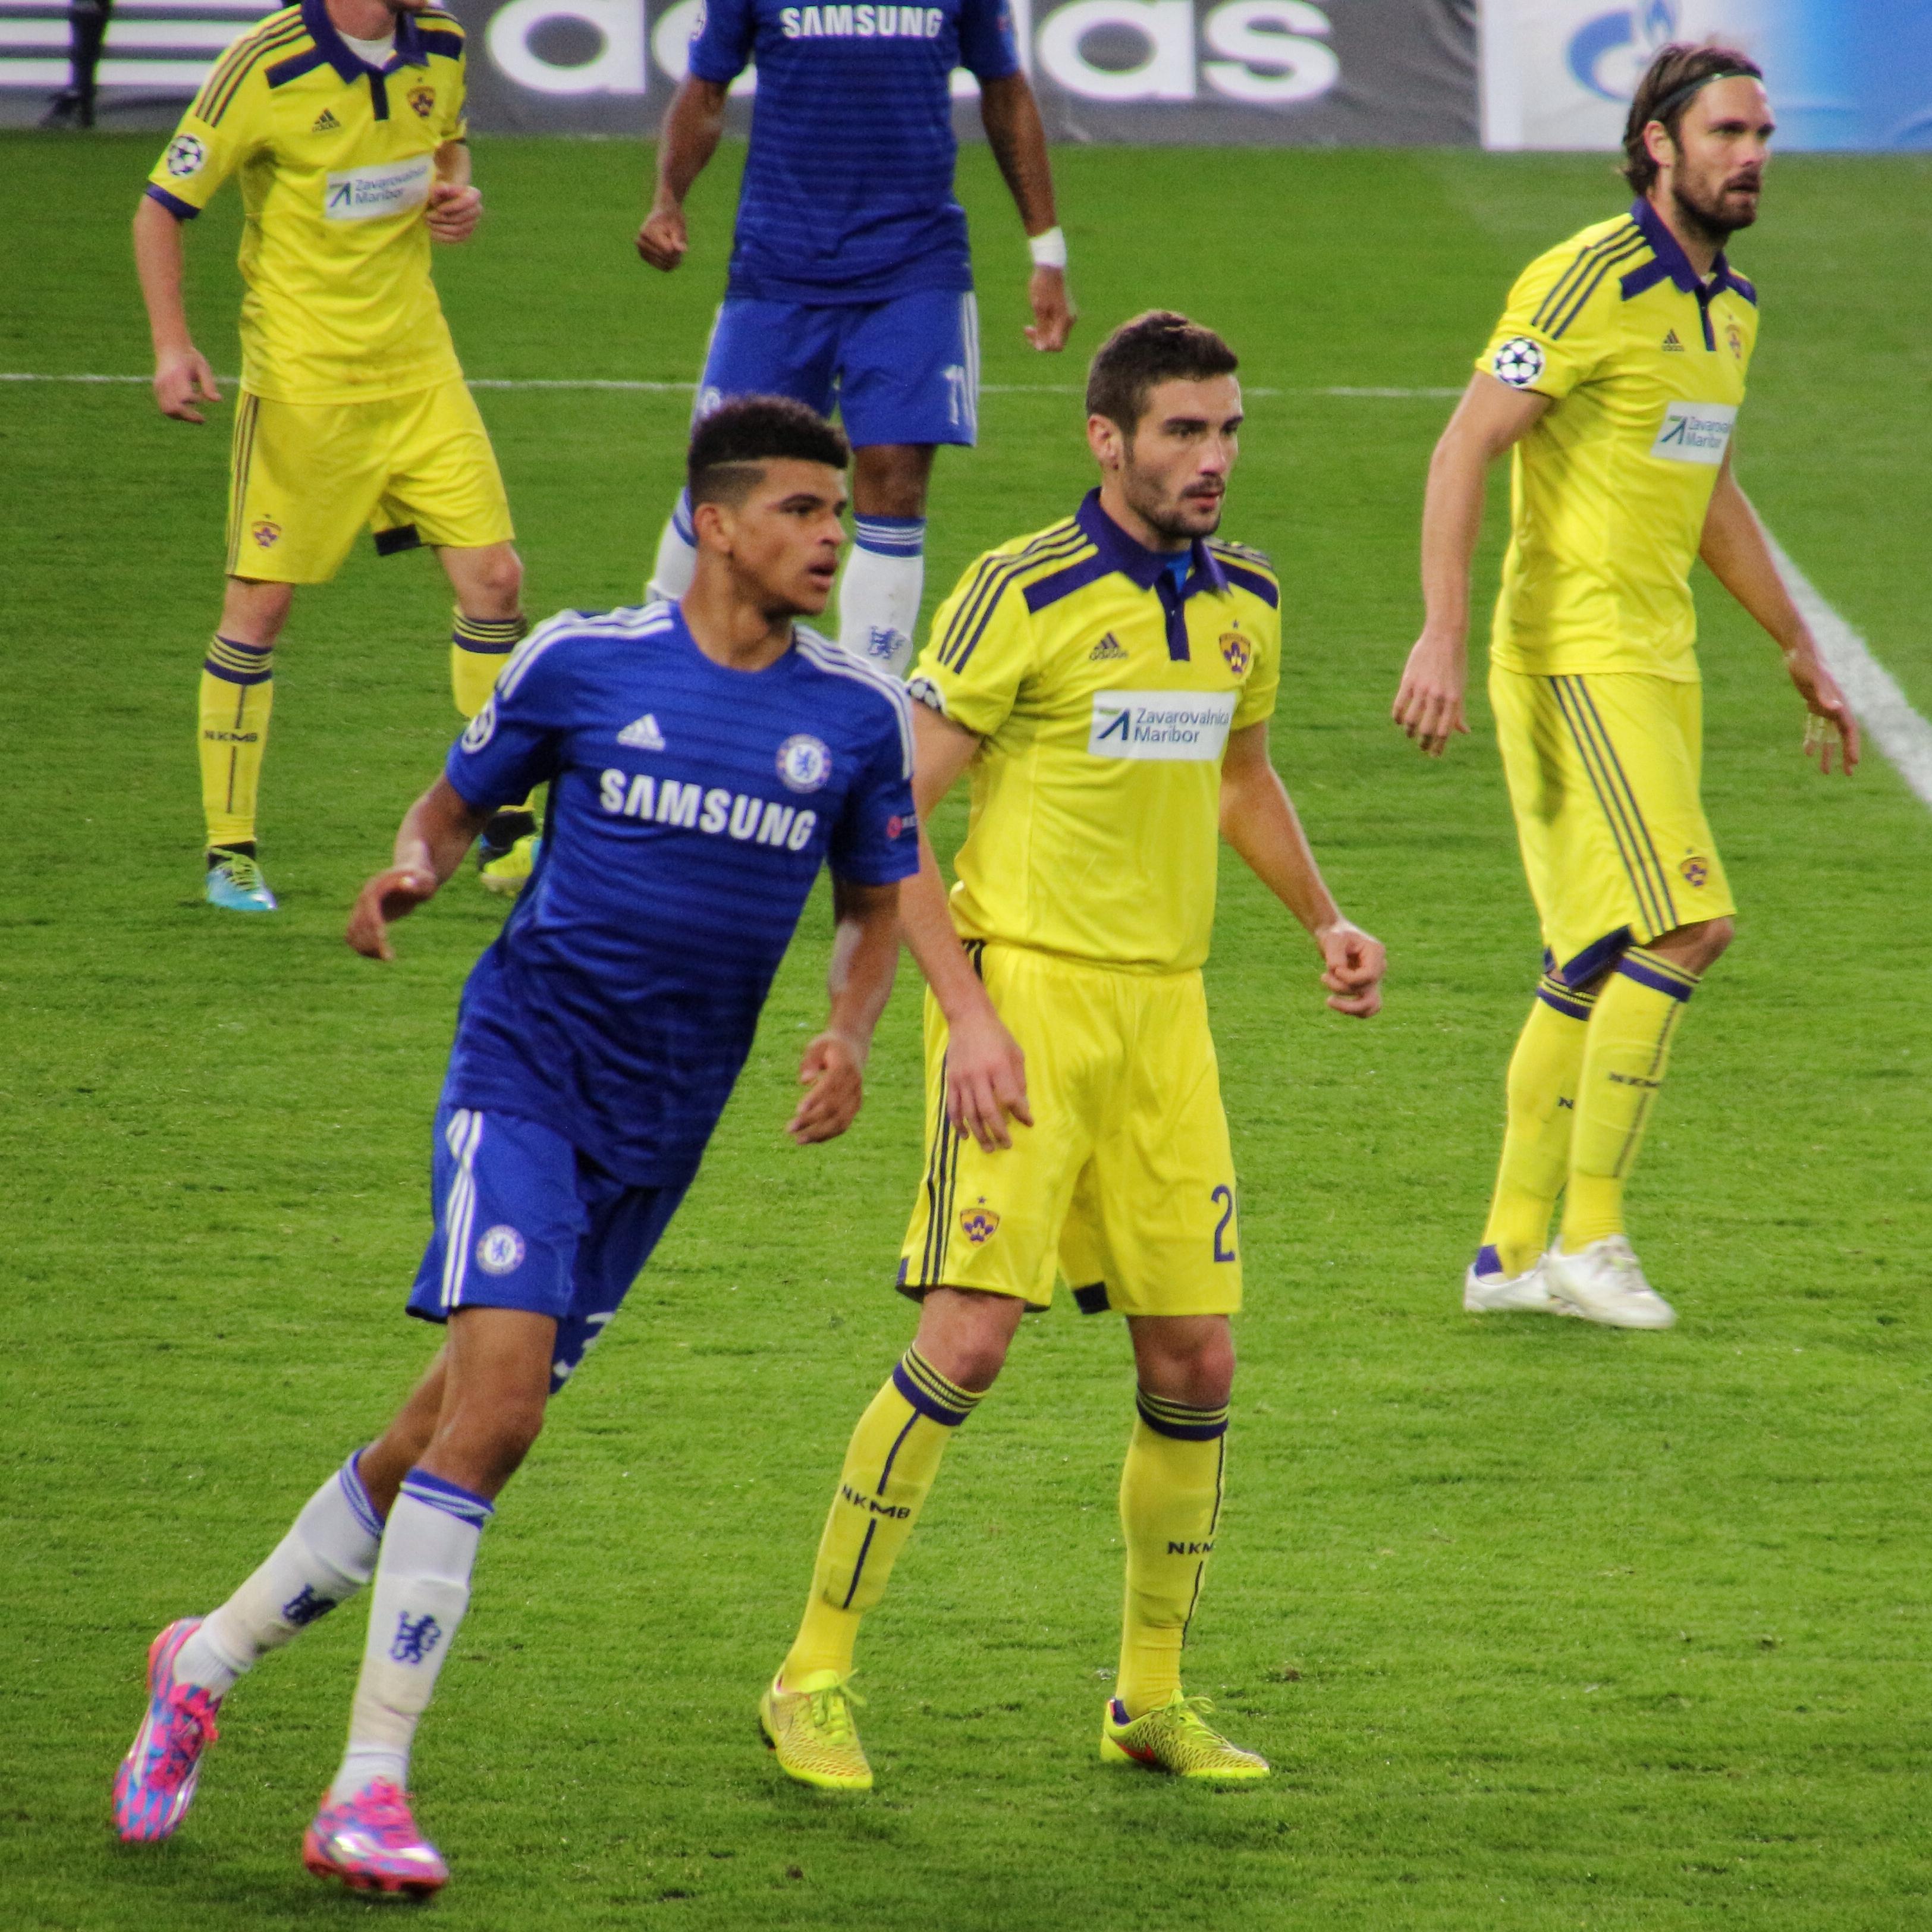 Tiedosto Chelsea 6 Maribor 0 Champions League (14979407503).jpg ... 0af08ca0d6